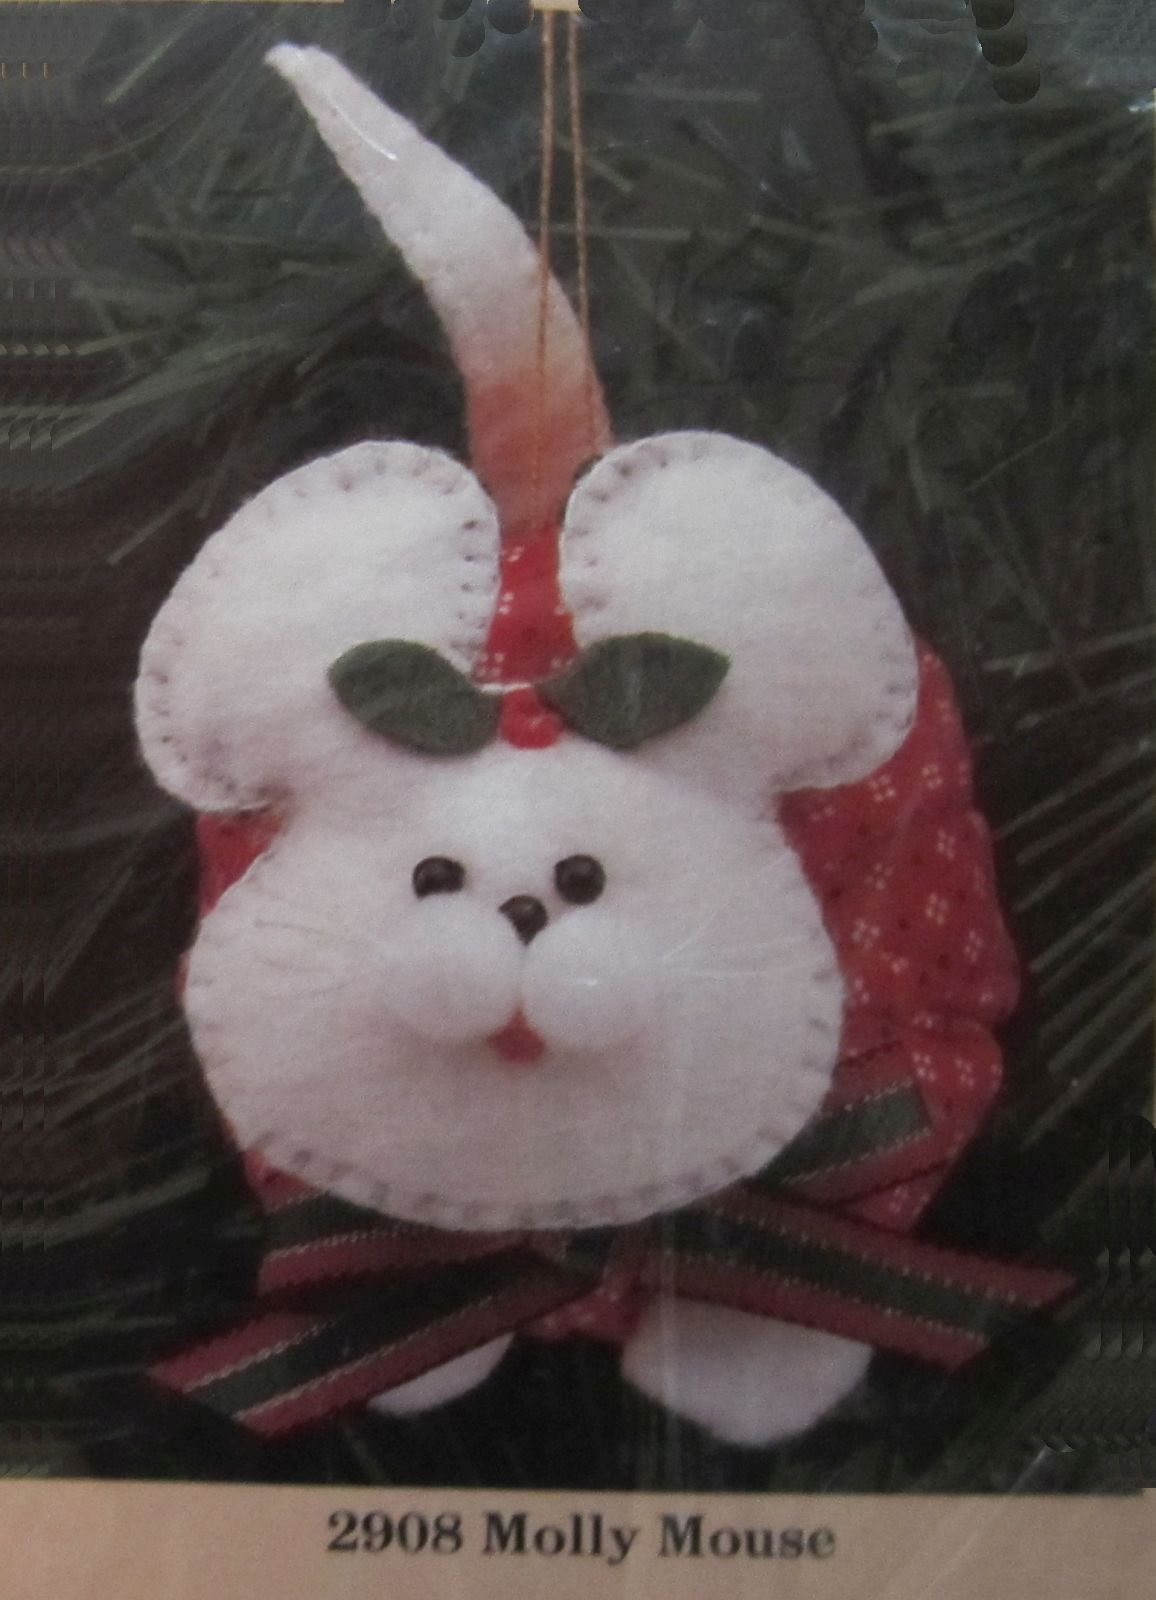 "1989 Creative Circle Felt Stuffed Molly Mouse Christmas Ornament Kit 3"" x 5"" - $14.99"